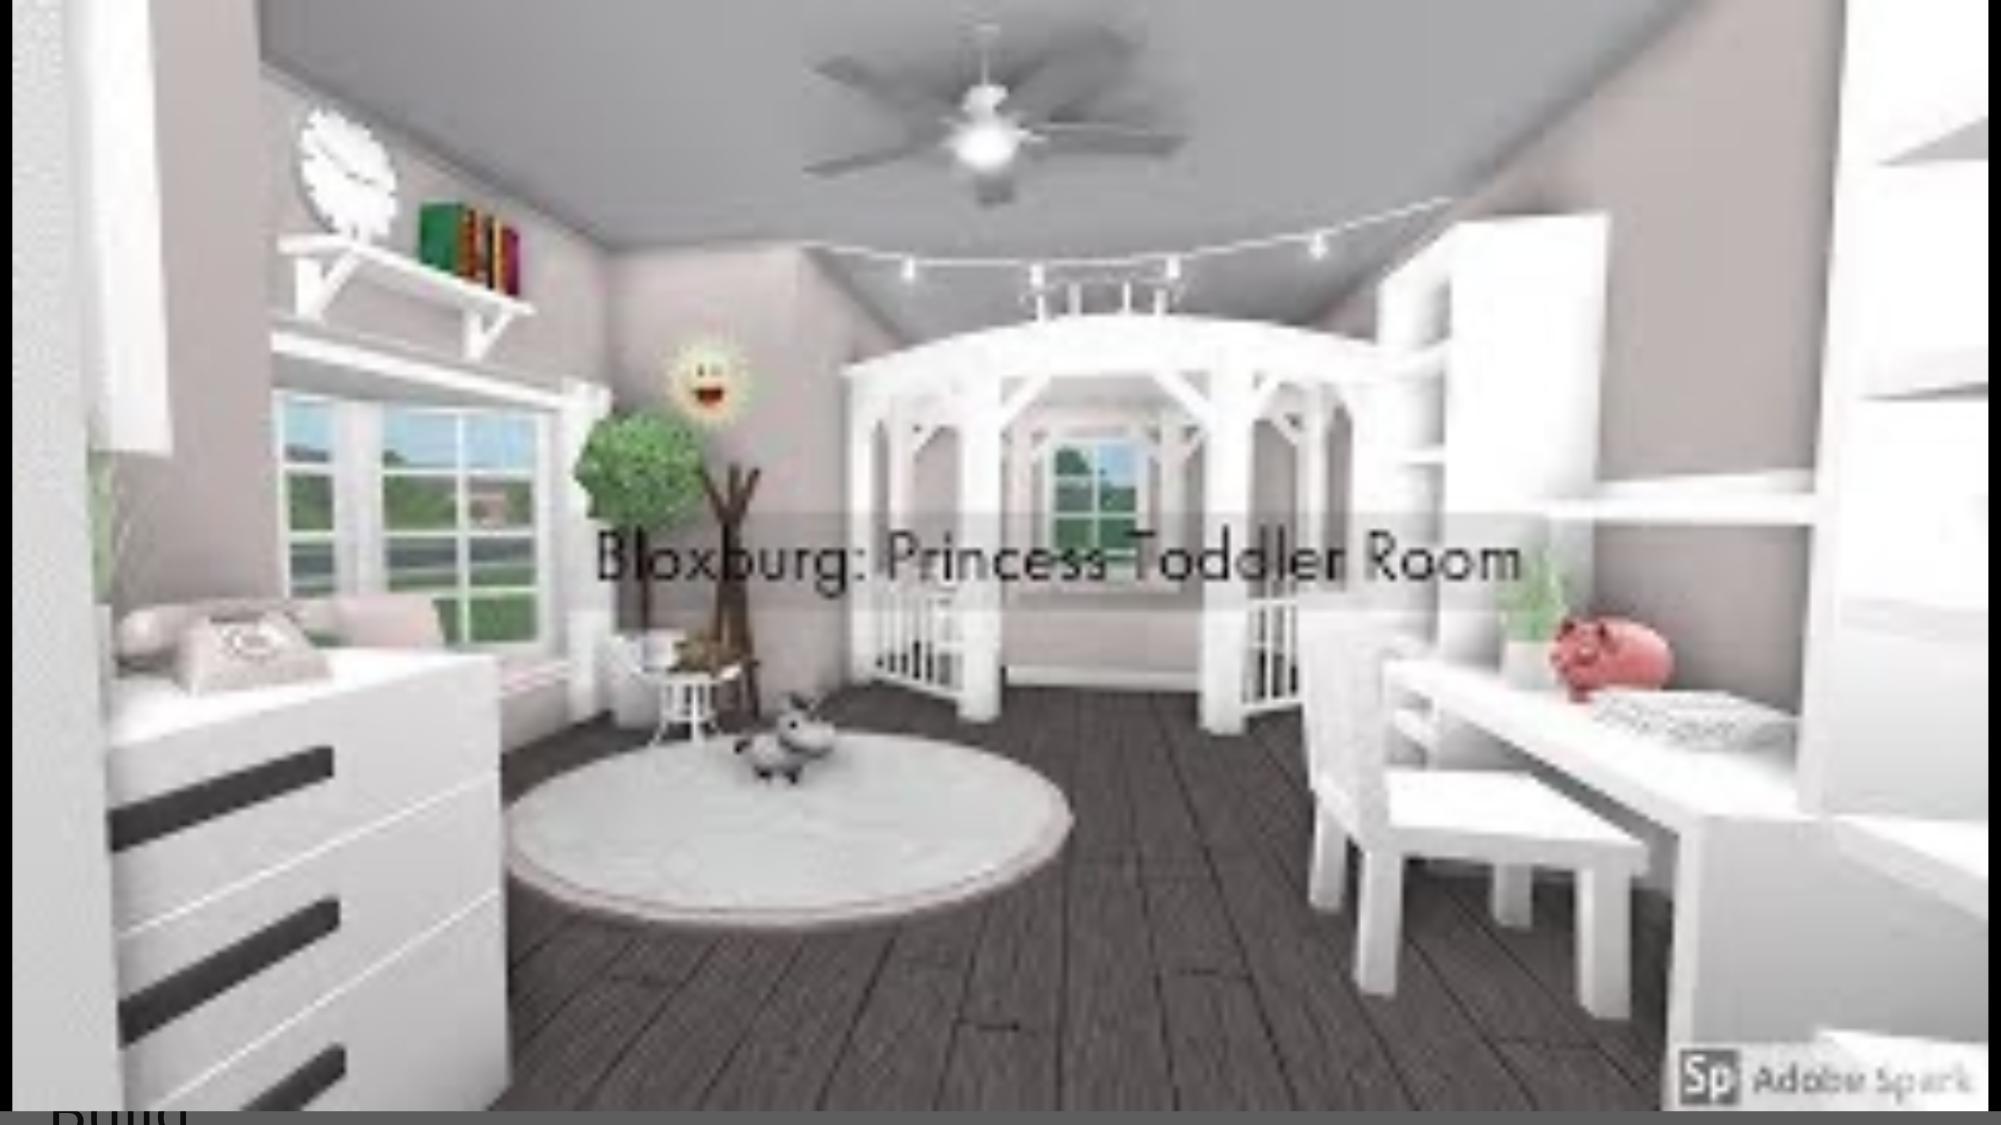 Pin By Addie On Bloxburg In 2020 Room Design Room Design Bedroom Aesthetic Bedroom